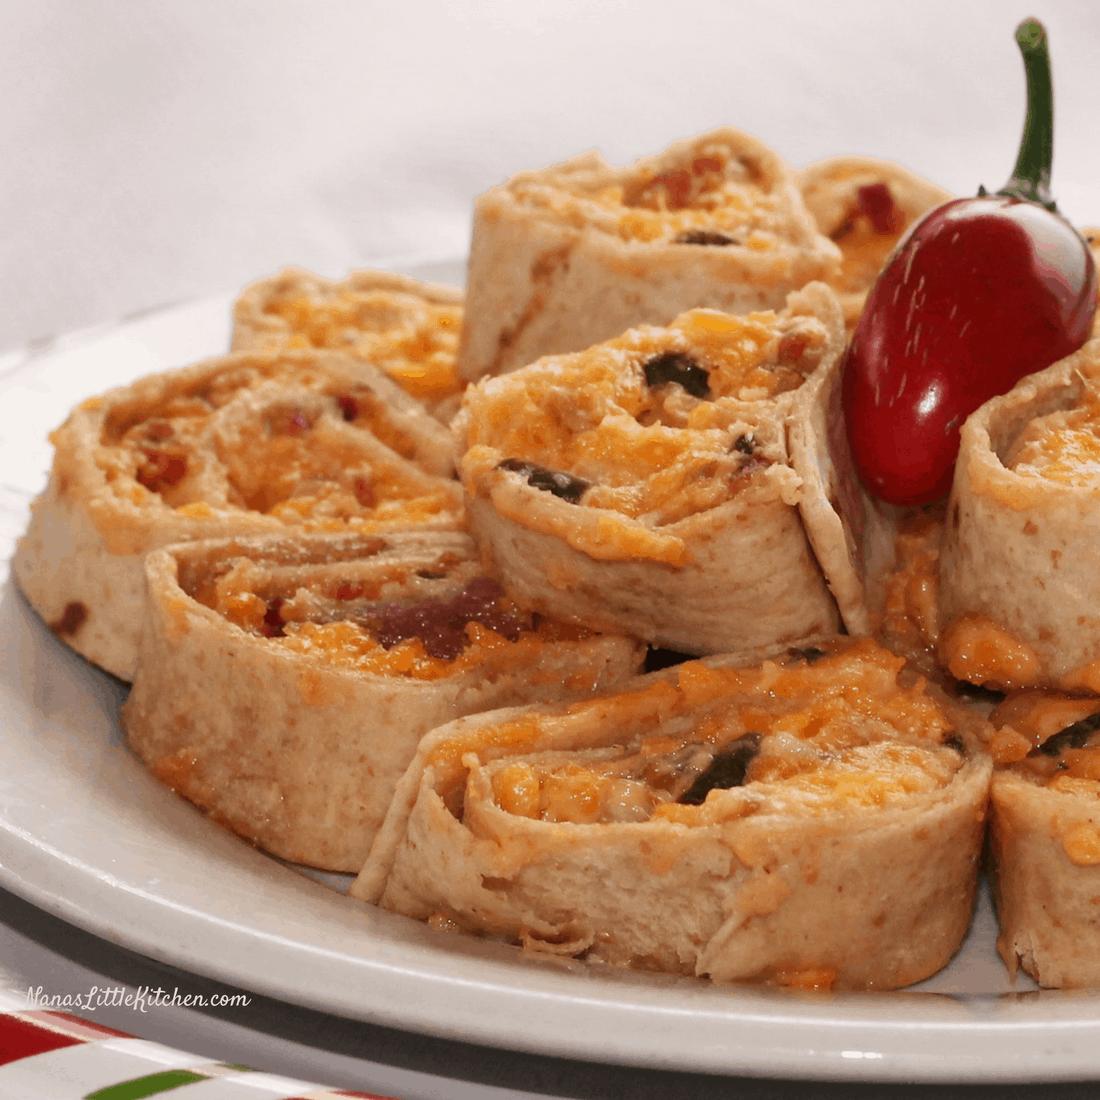 Jalapeno Popper Pimento Cheese